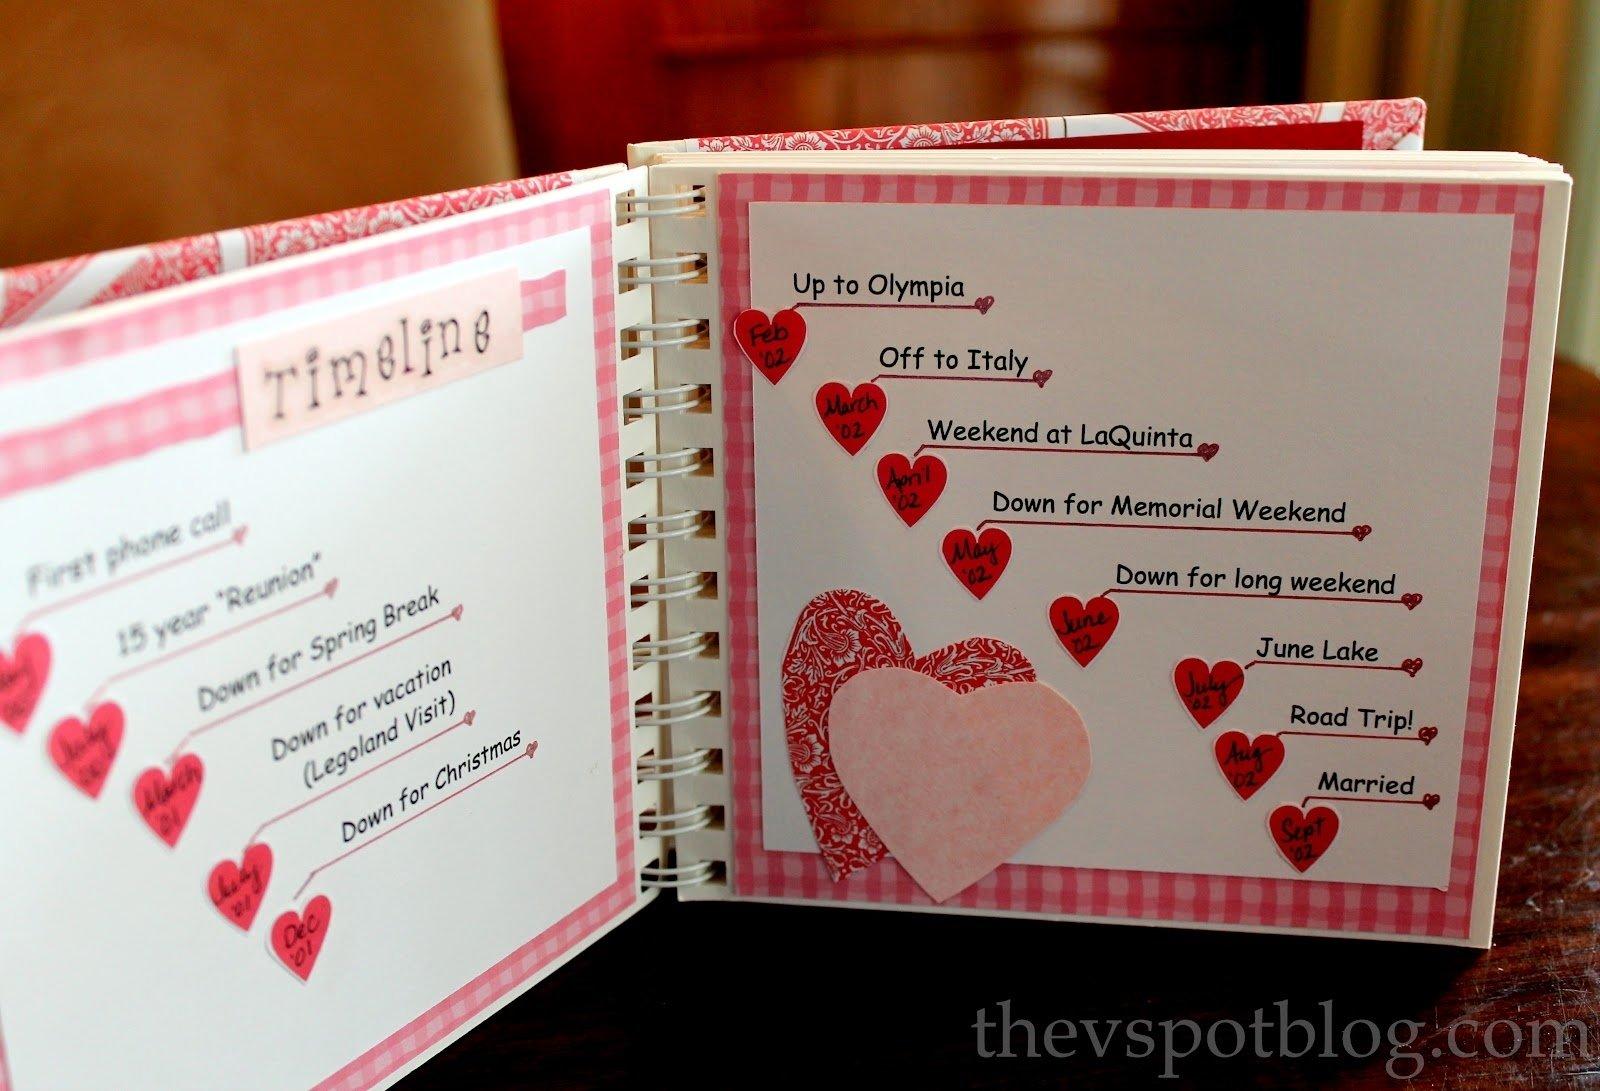 10 Fashionable Cute Ideas For Boyfriend On Valentines Day valentine day new creative ideas boyfriend husband him home art 39 2020